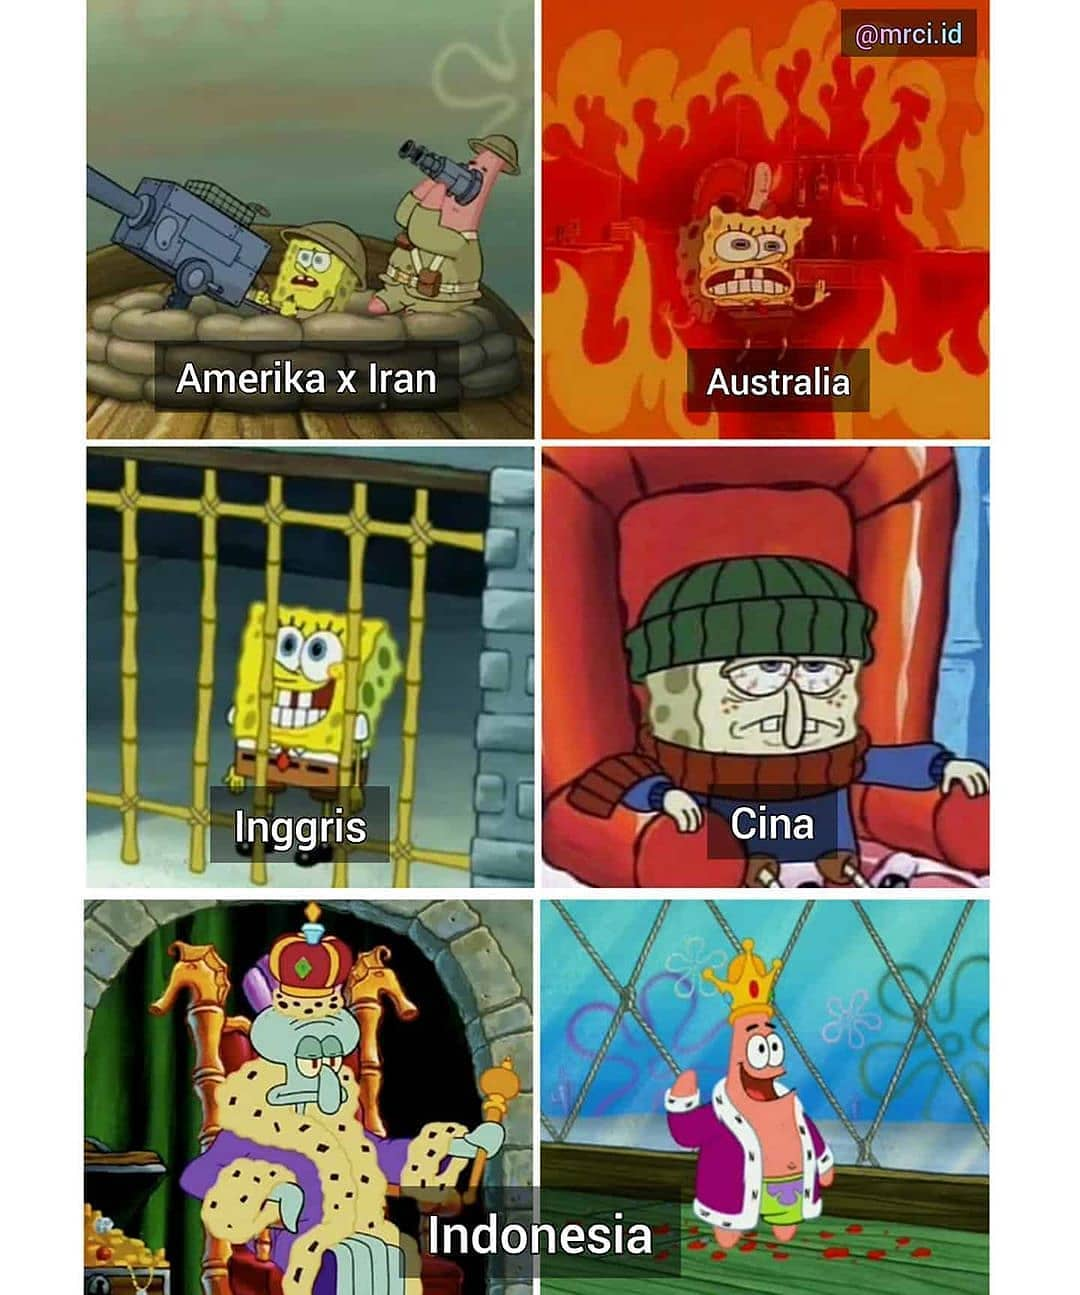 11 Meme Lucu Sunda Empire Ini Dijamin Bikin Kamu NGAKAK